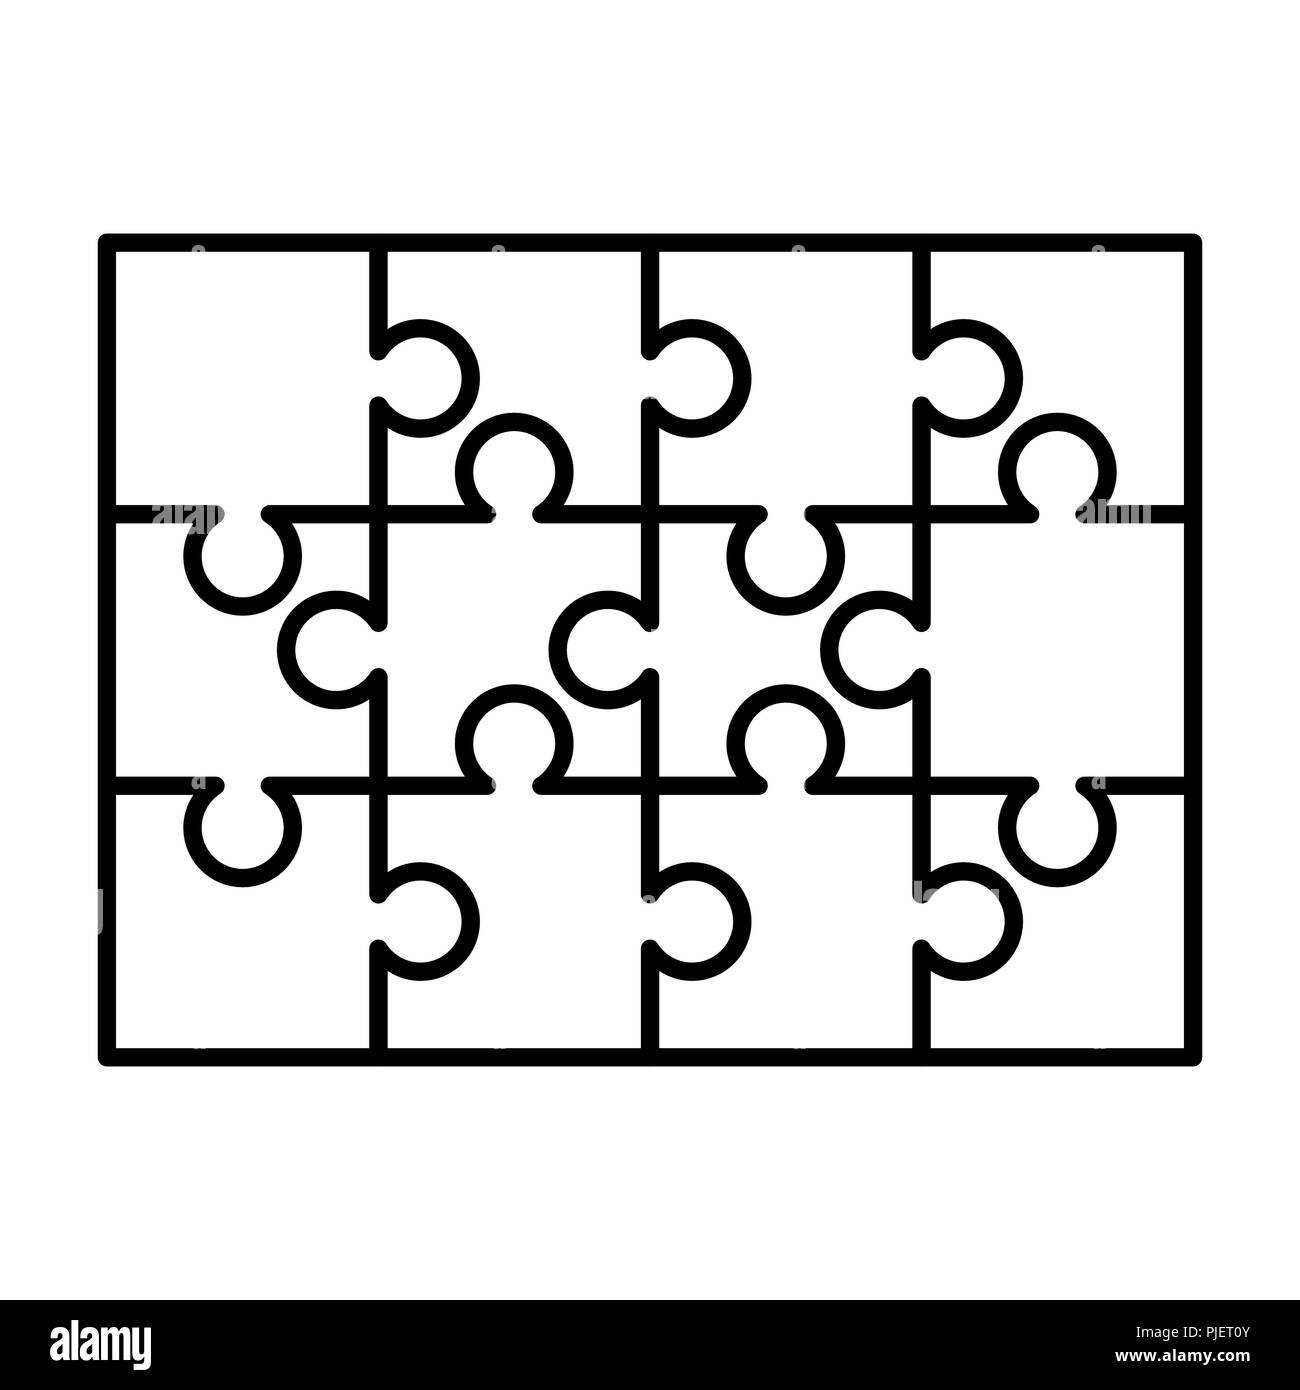 12 wei en puzzles teile in einem rechteck angeordnet. Black Bedroom Furniture Sets. Home Design Ideas